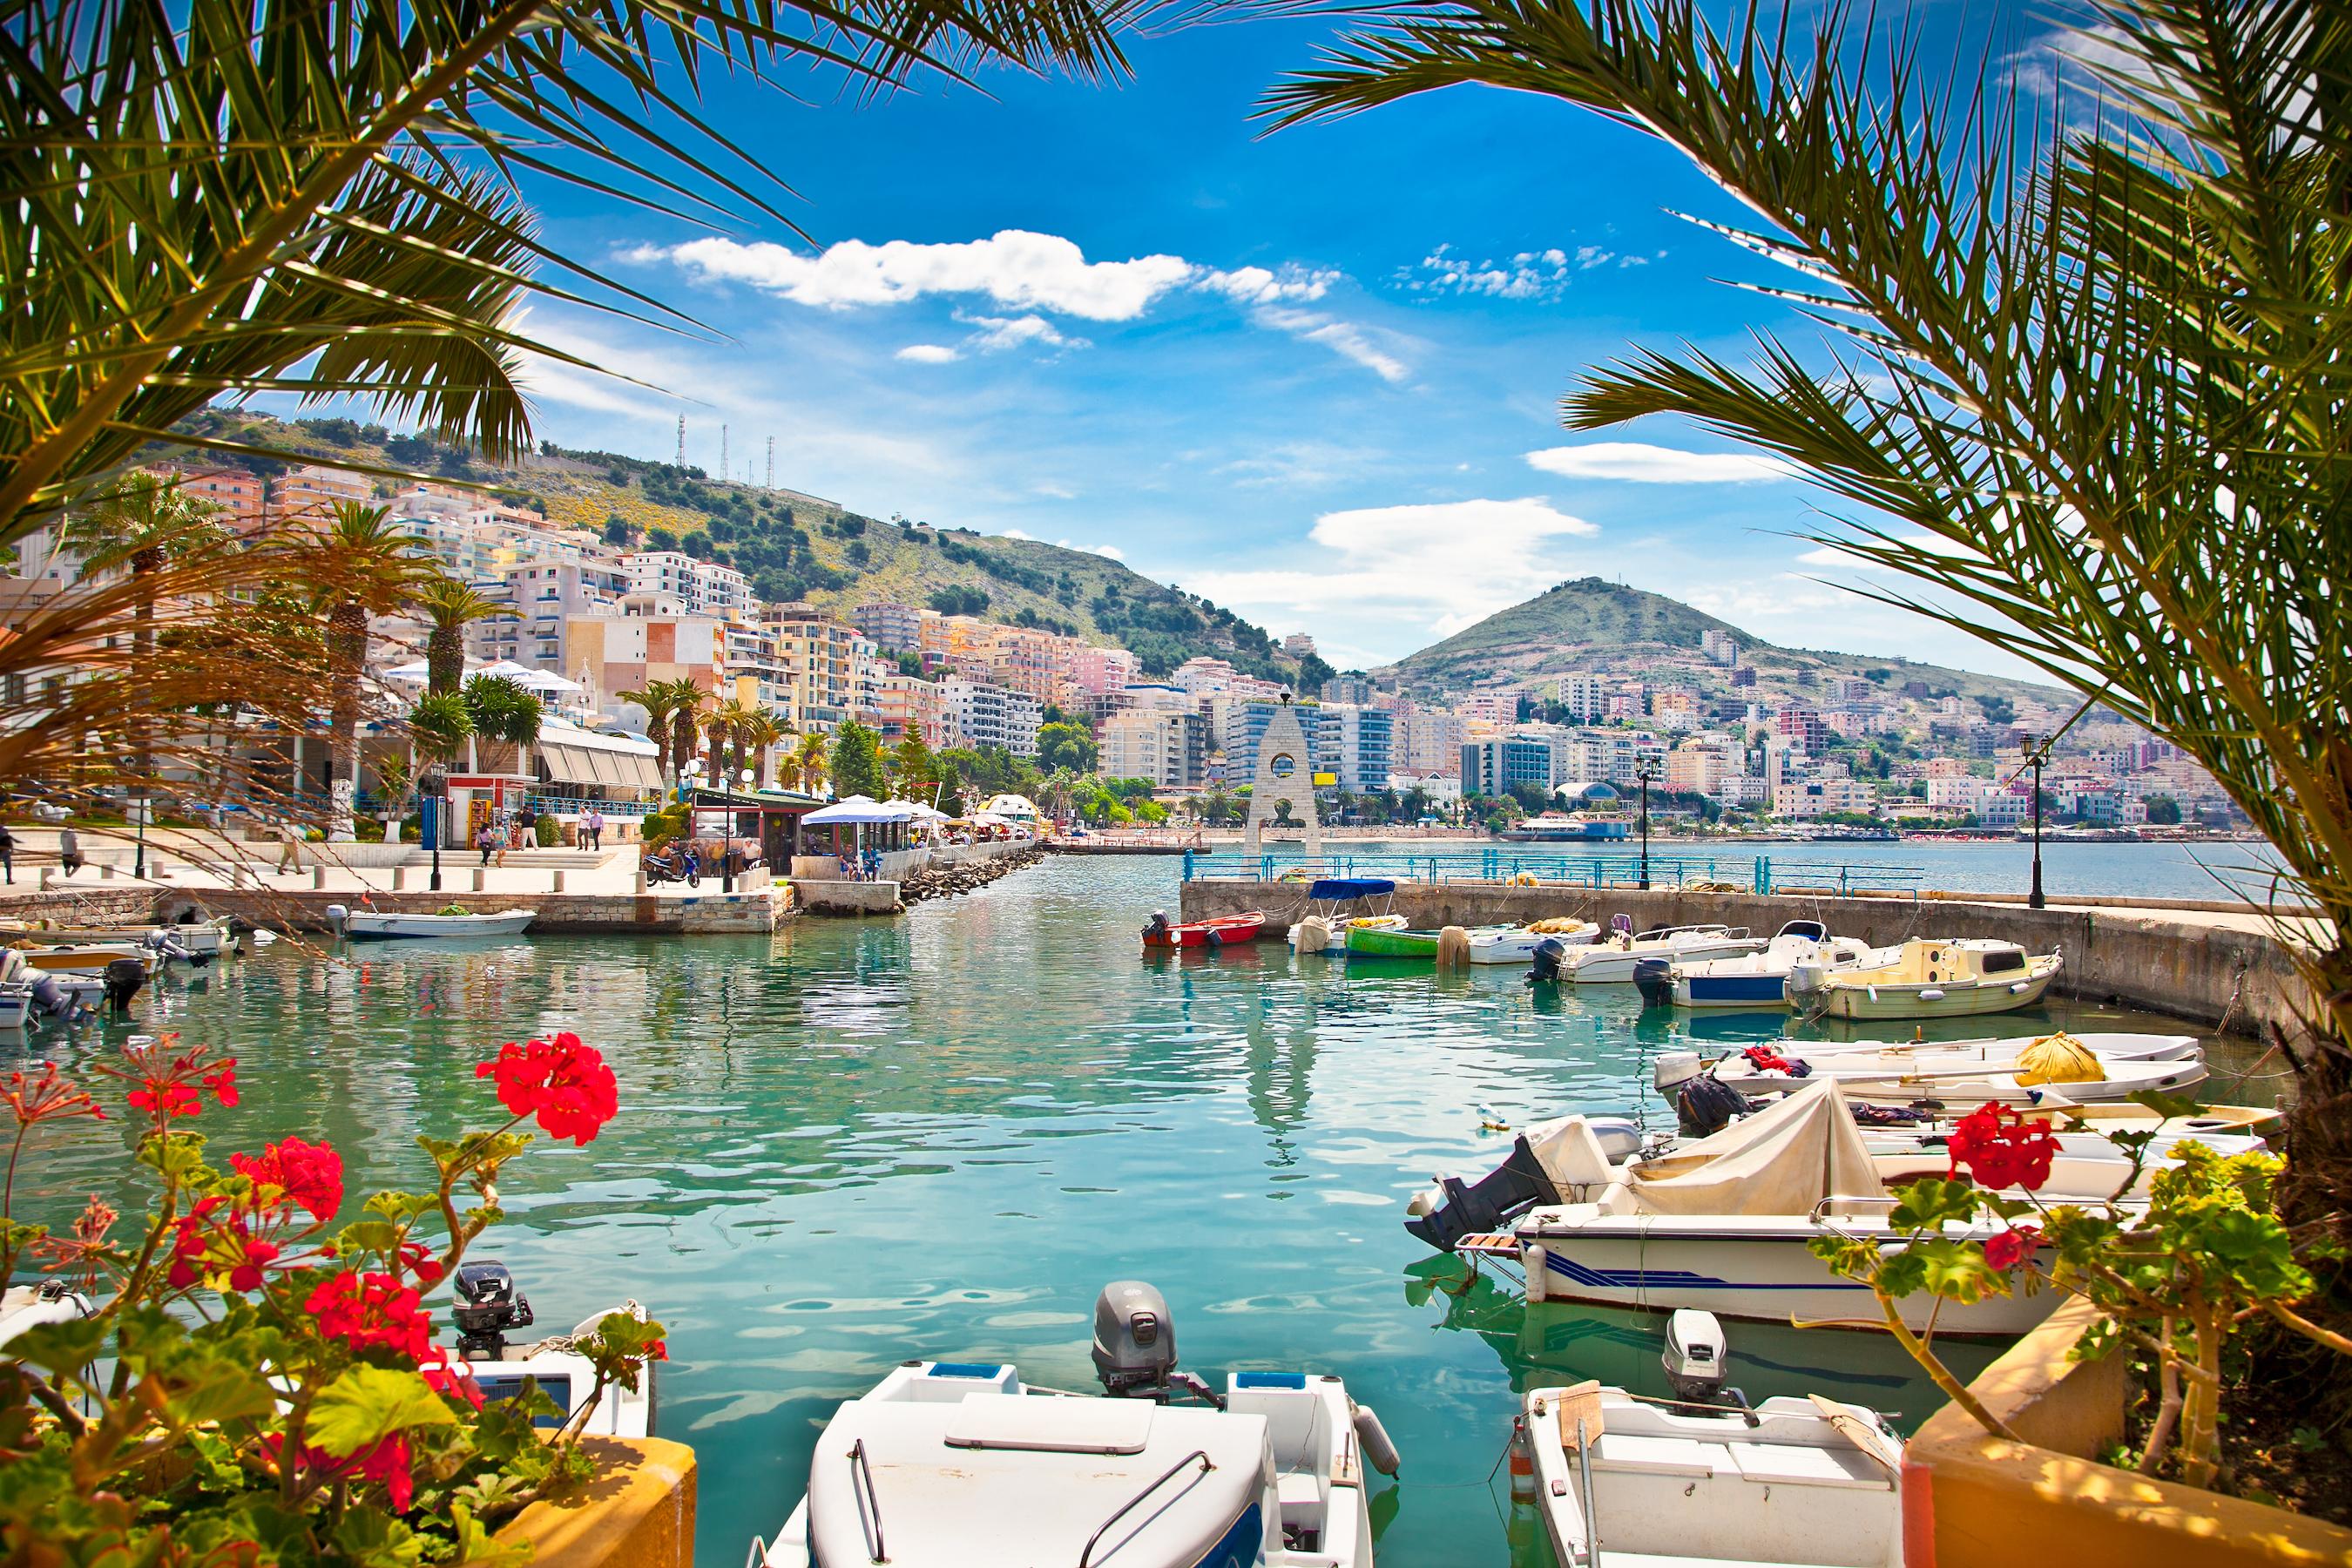 Destination image of Albanie